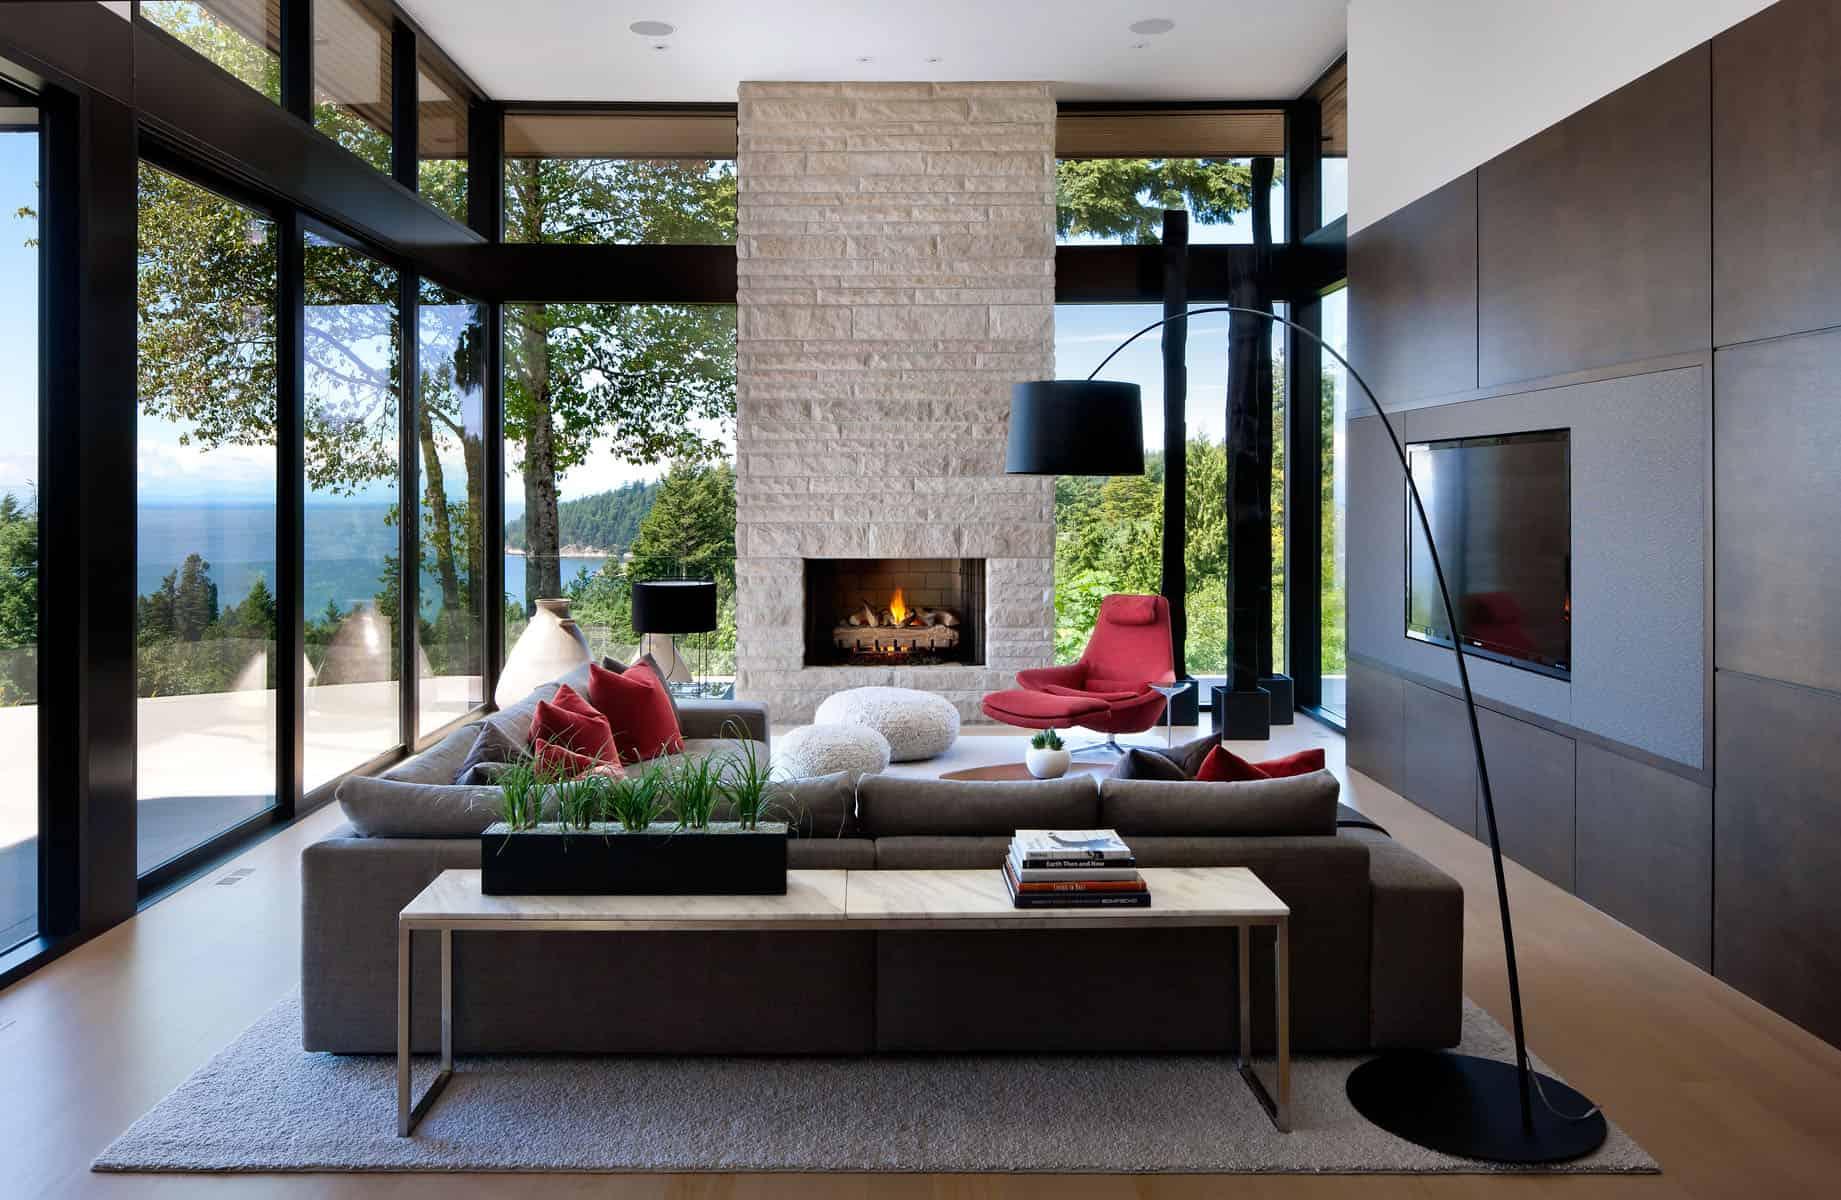 Interior designer home vancouver - Burkehill Residence By Craig Chevalier And Raven Inside Interior Design